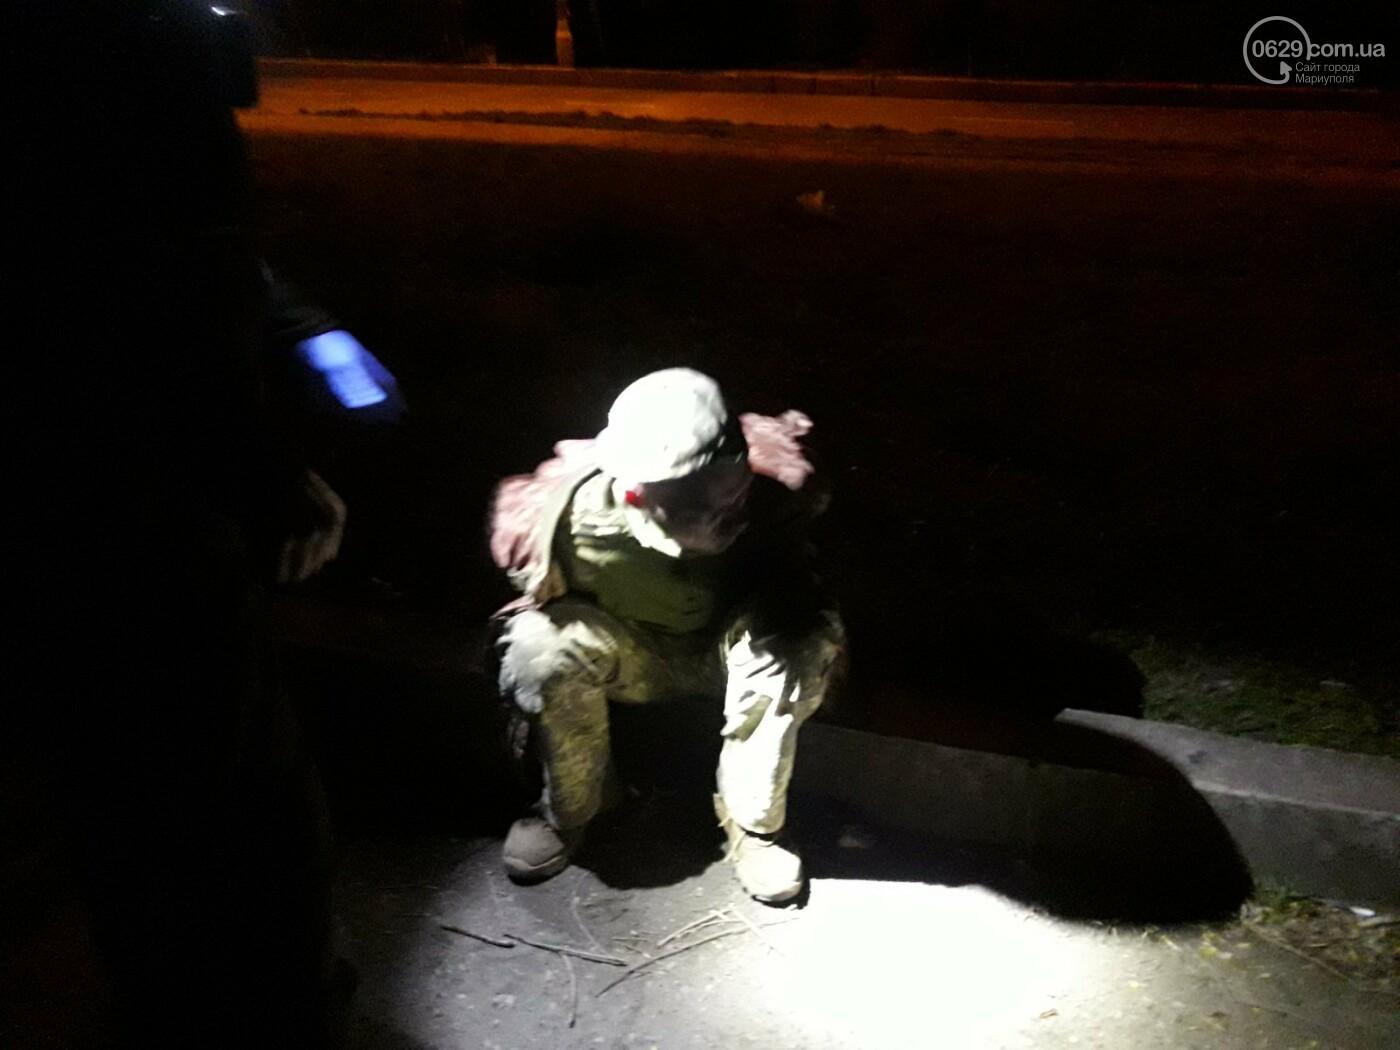 В Мариуполе задержали военного под кайфом с наркотиками в кармане, - ФОТО, фото-3